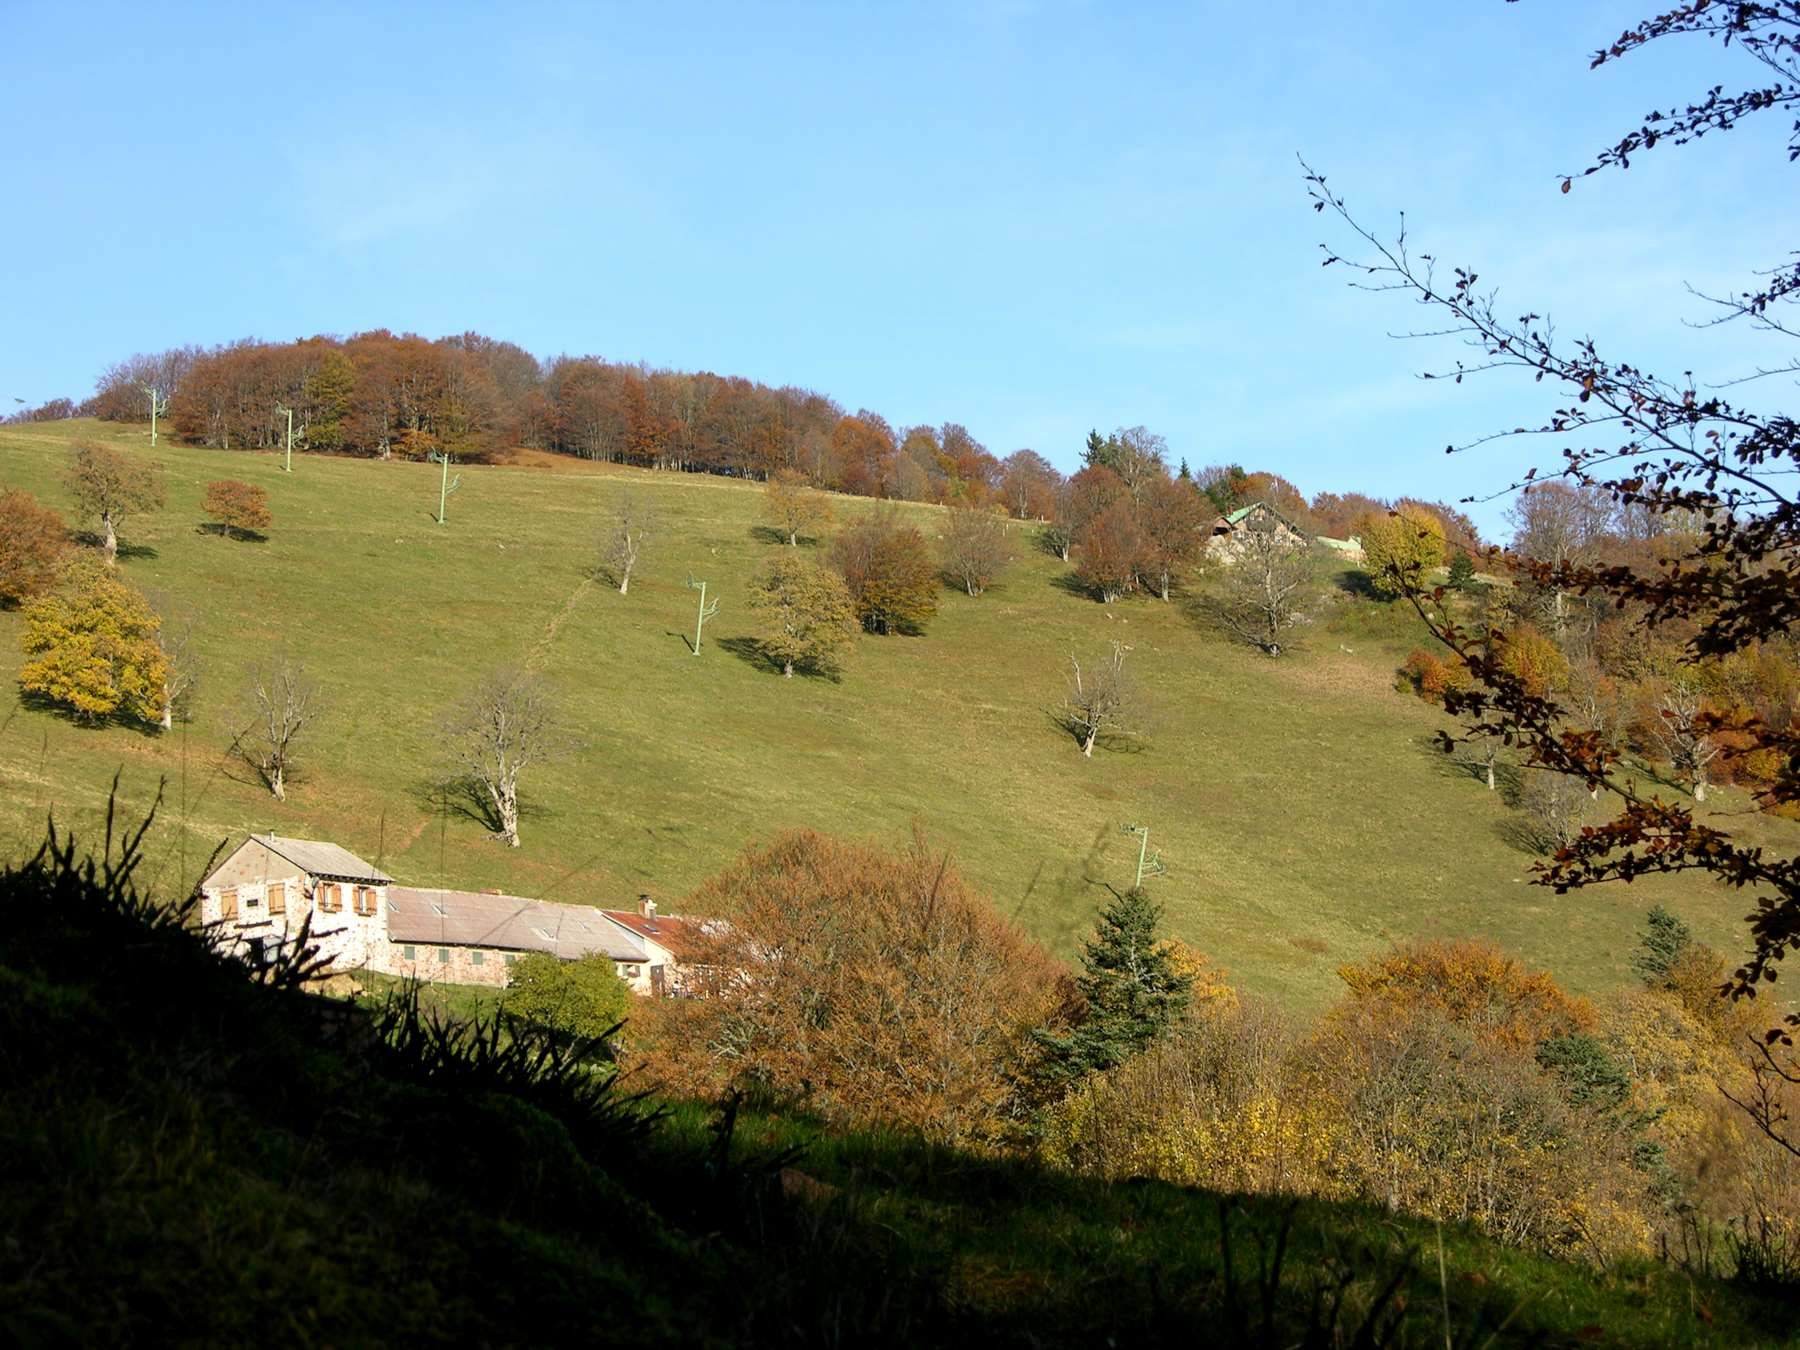 Berggasthof Thannerhubel